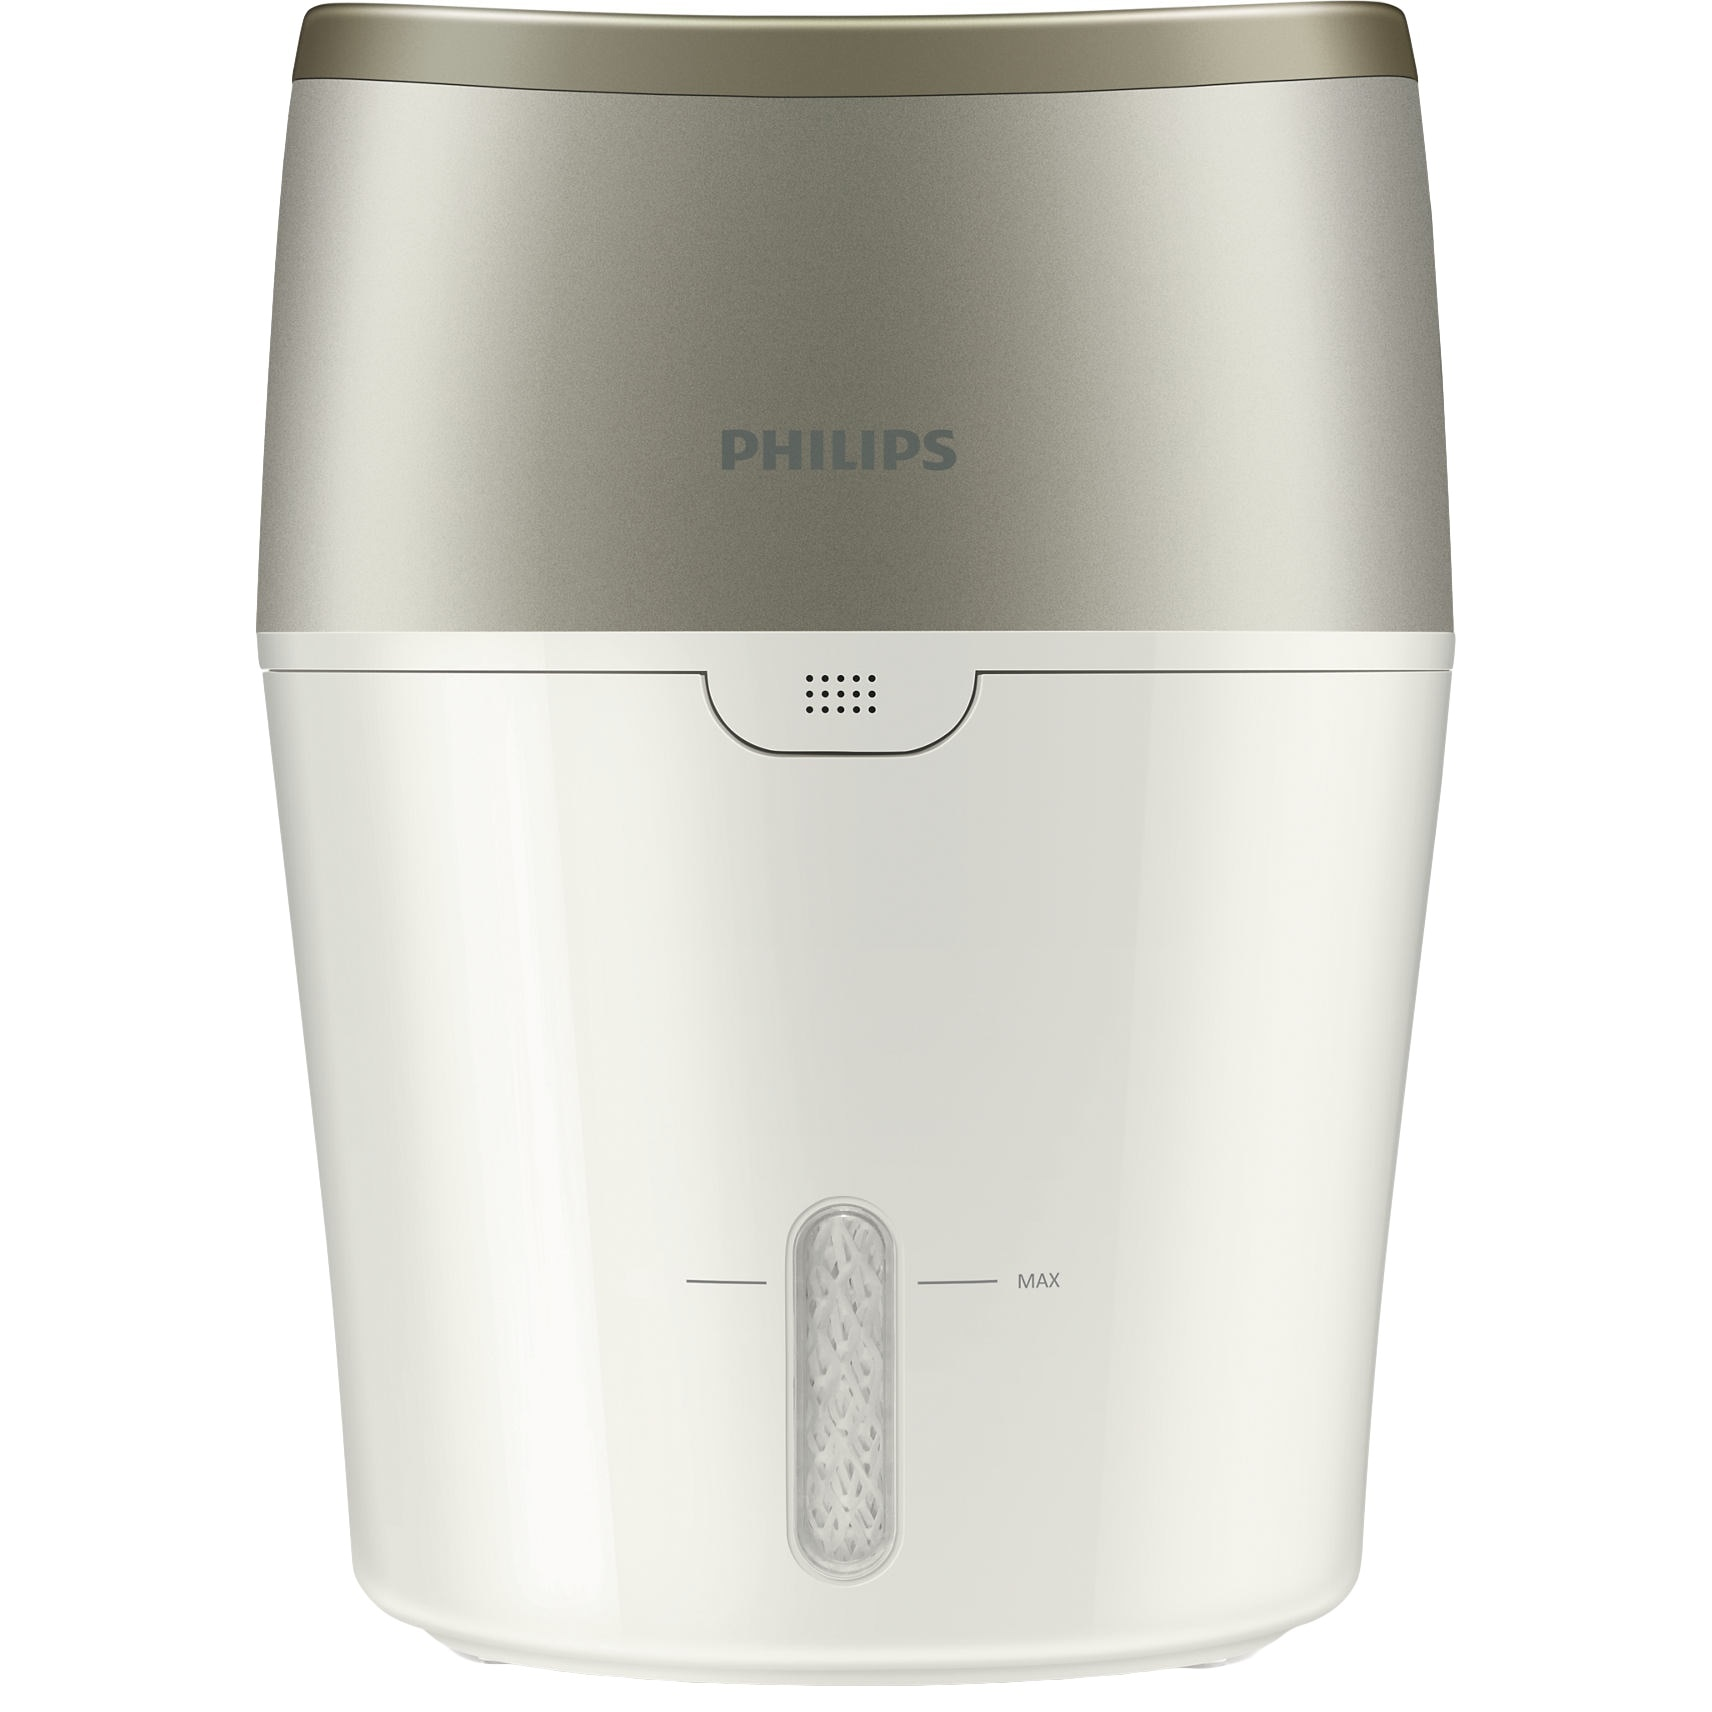 Fotografie Umidificator de aer Philips HU4803/01, Tehnologie NanoCloud, Rezervor 2 l, 220 ml/h, Alb/Gri